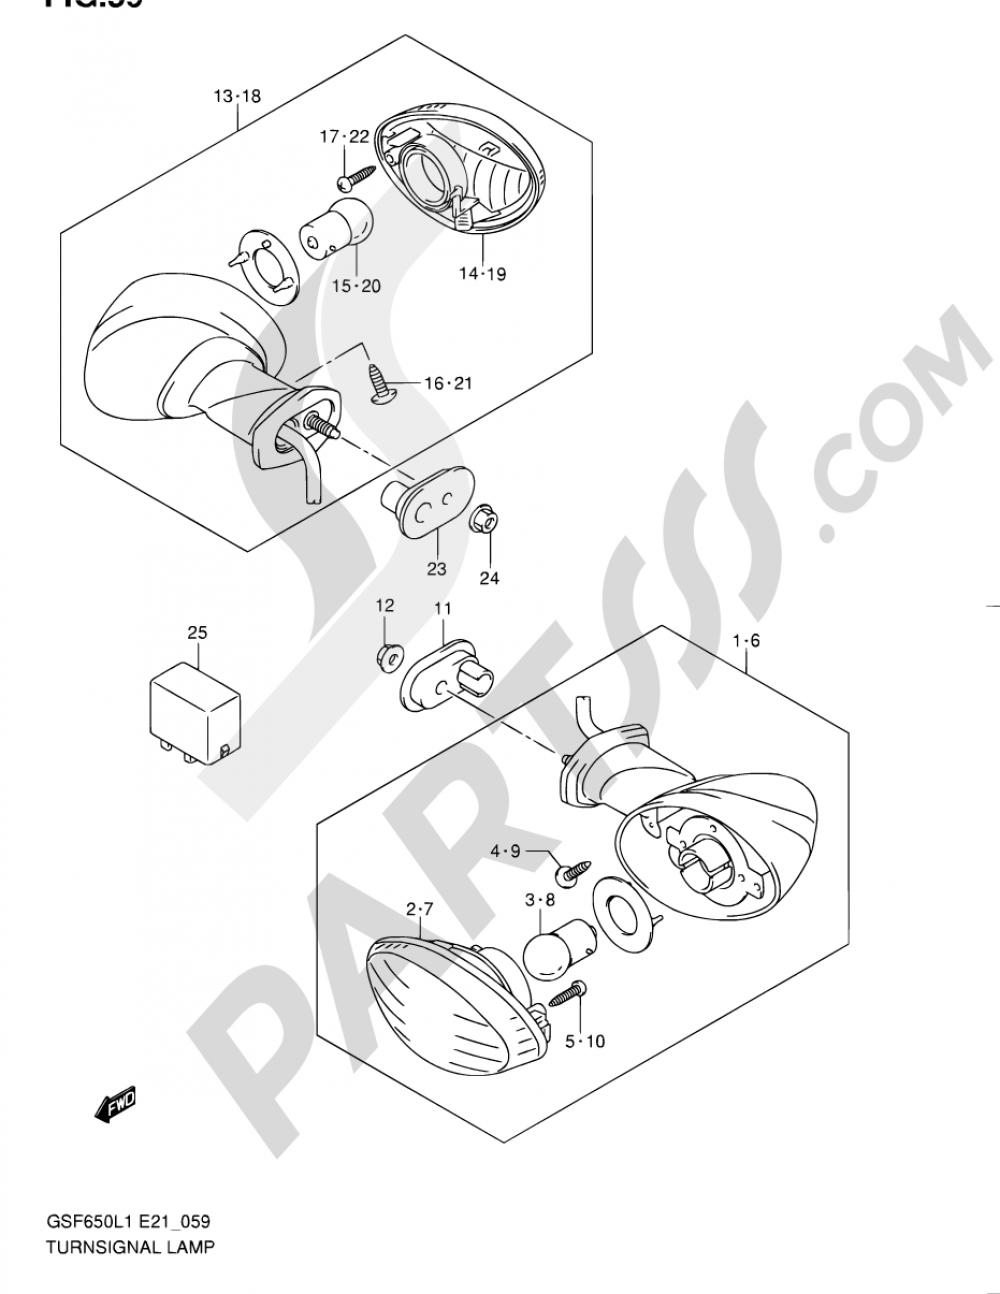 59 - TURNSIGNAL LAMP (GSF650UL1 E21) Suzuki BANDIT GSF650 2011